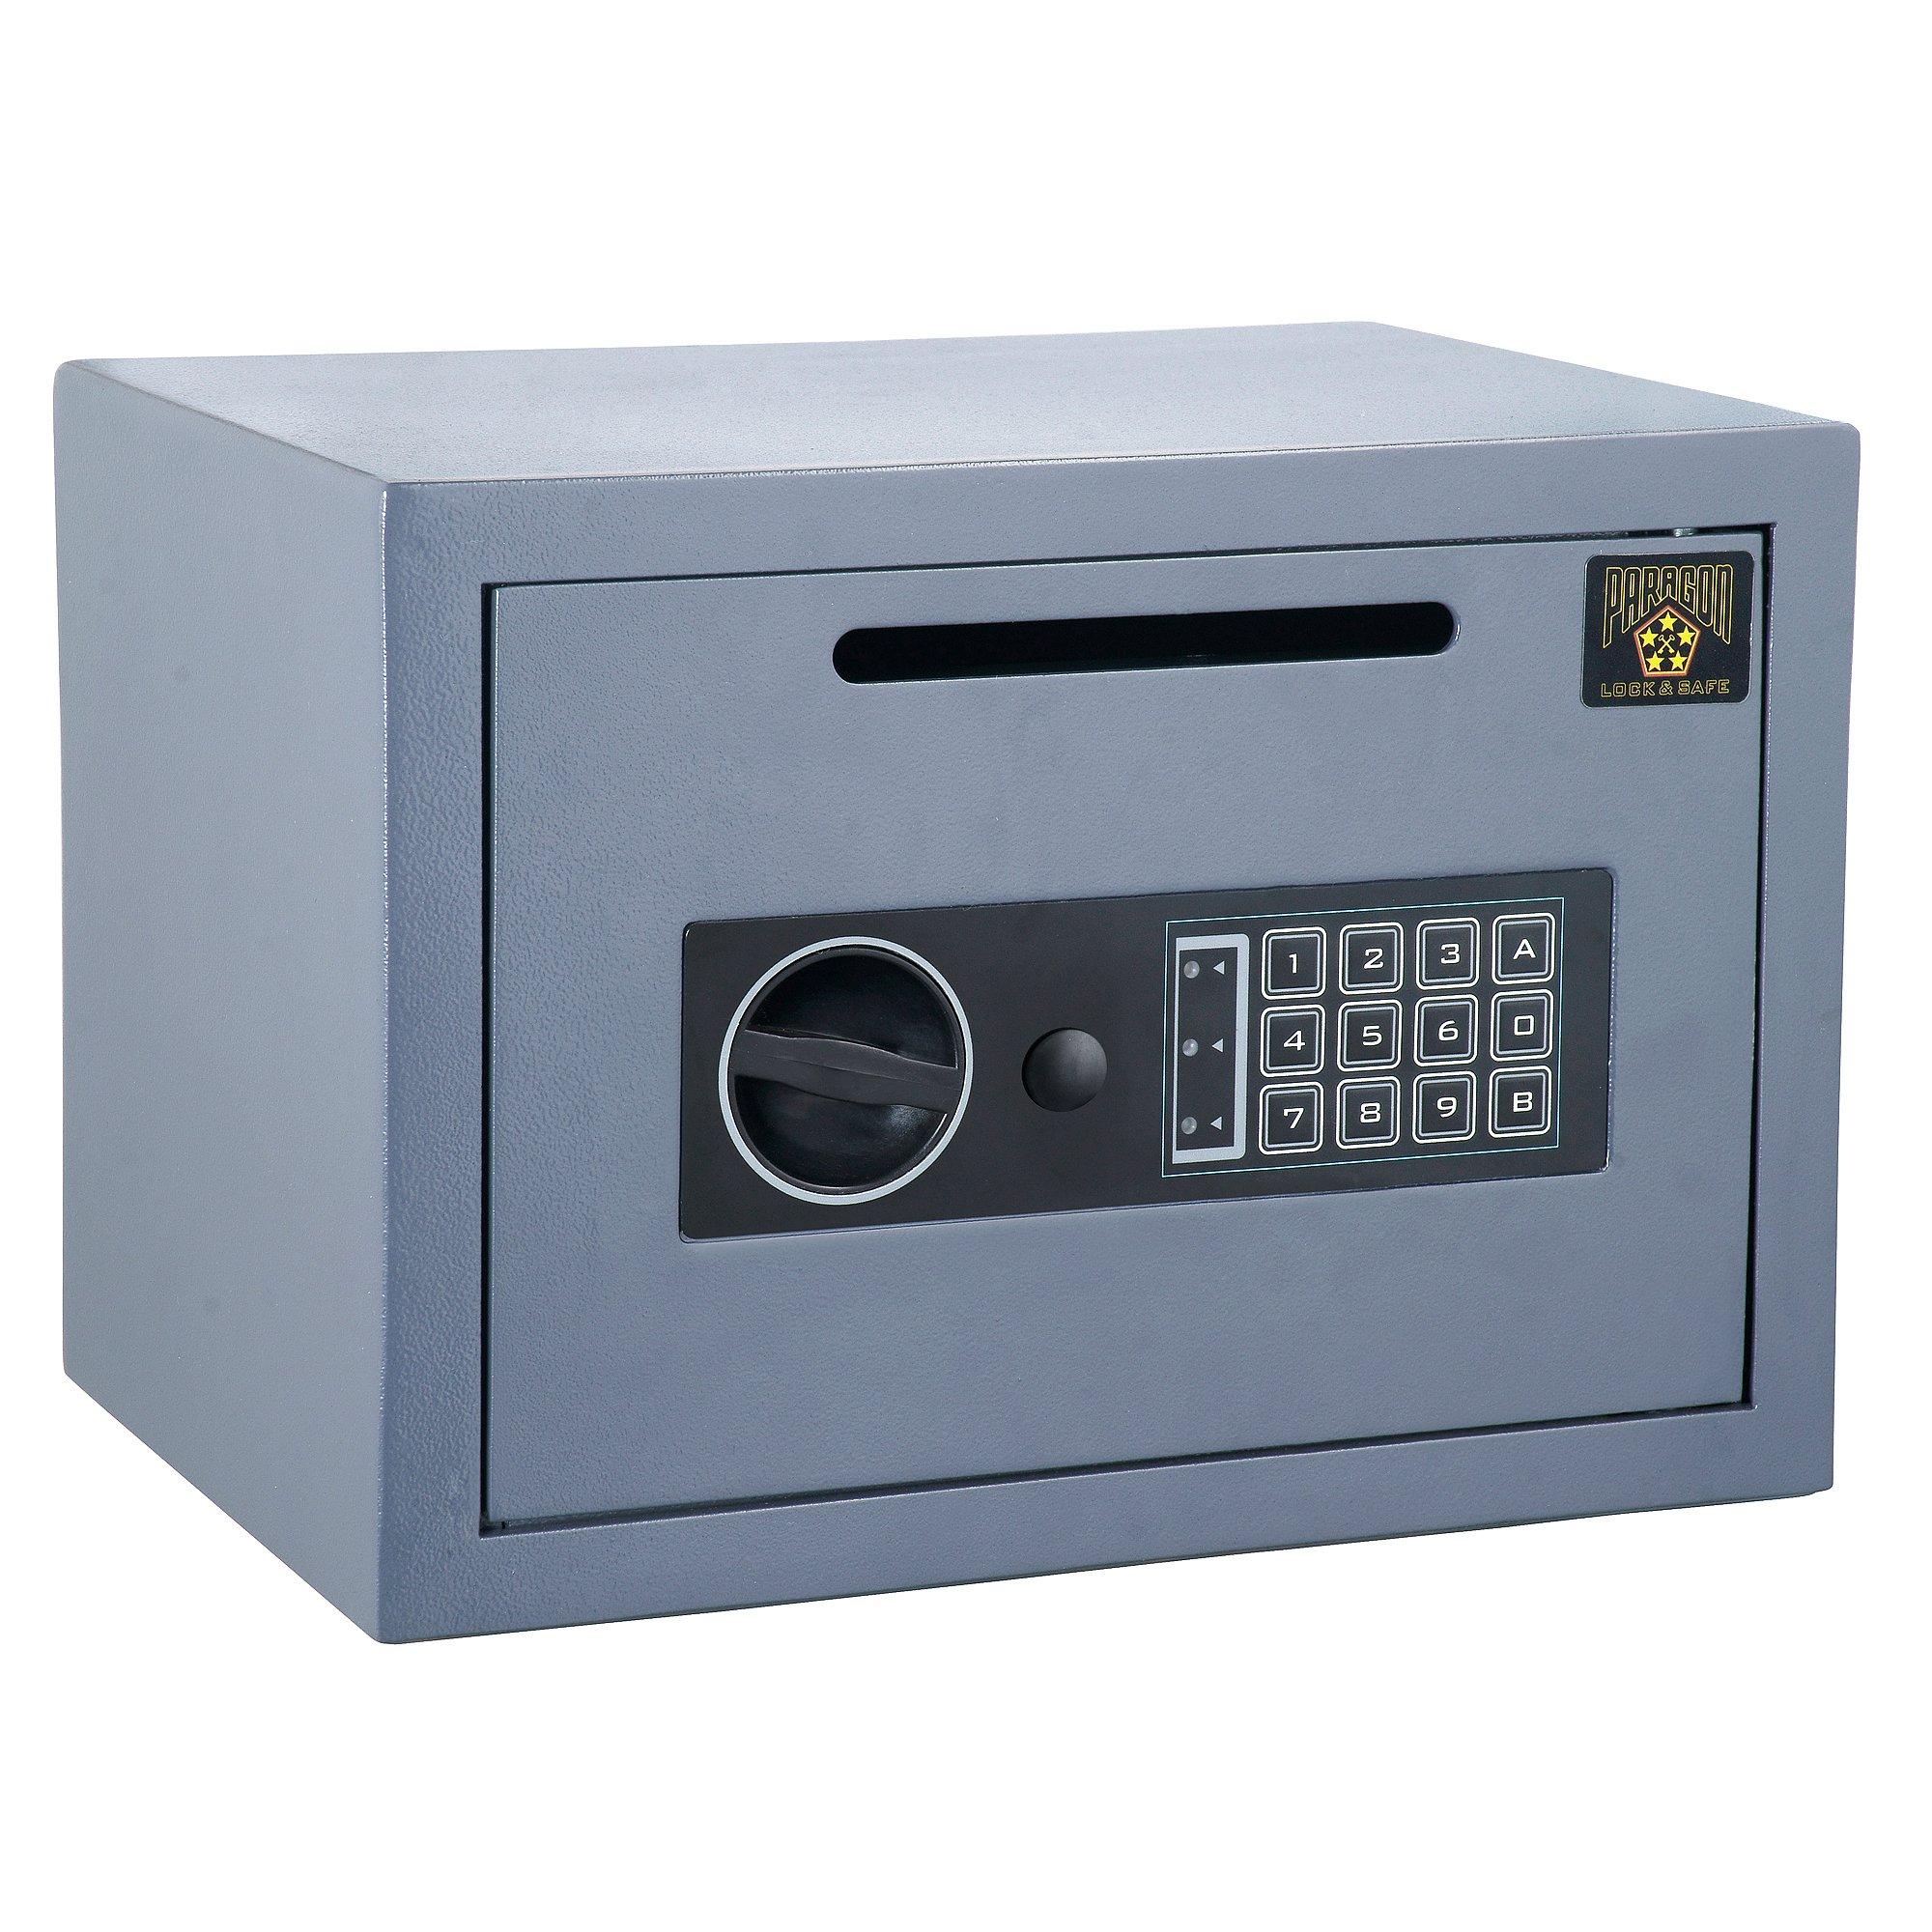 Paragon 7804 Digital Lock and Safe .54 CashKing Depository Cash Drop Safes